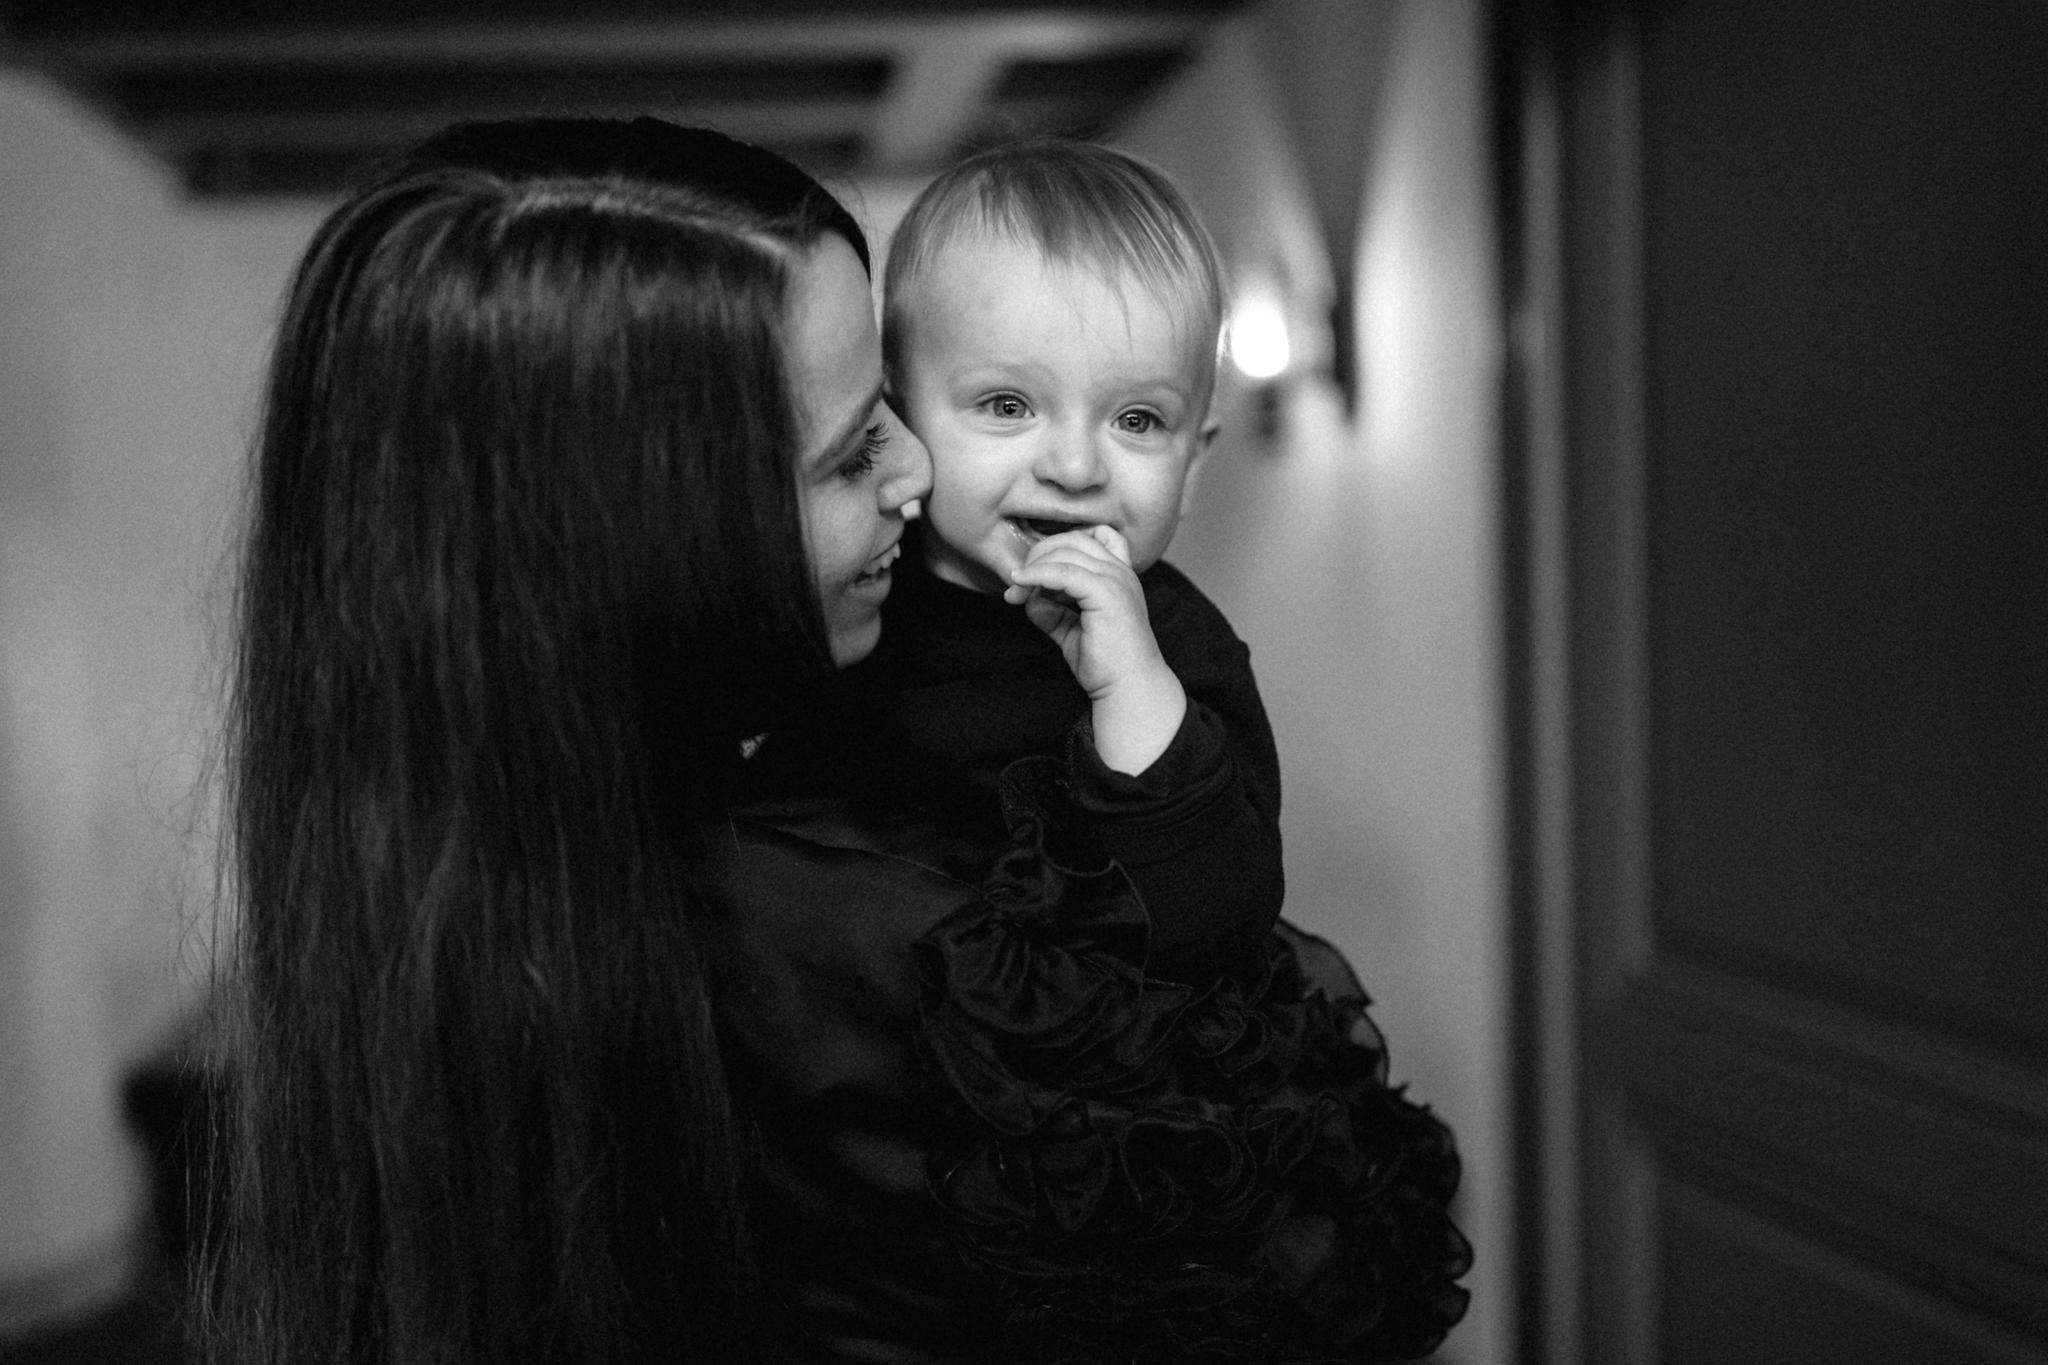 013-sjoerdbooijphotography-family-daan-lotte-bond.jpg